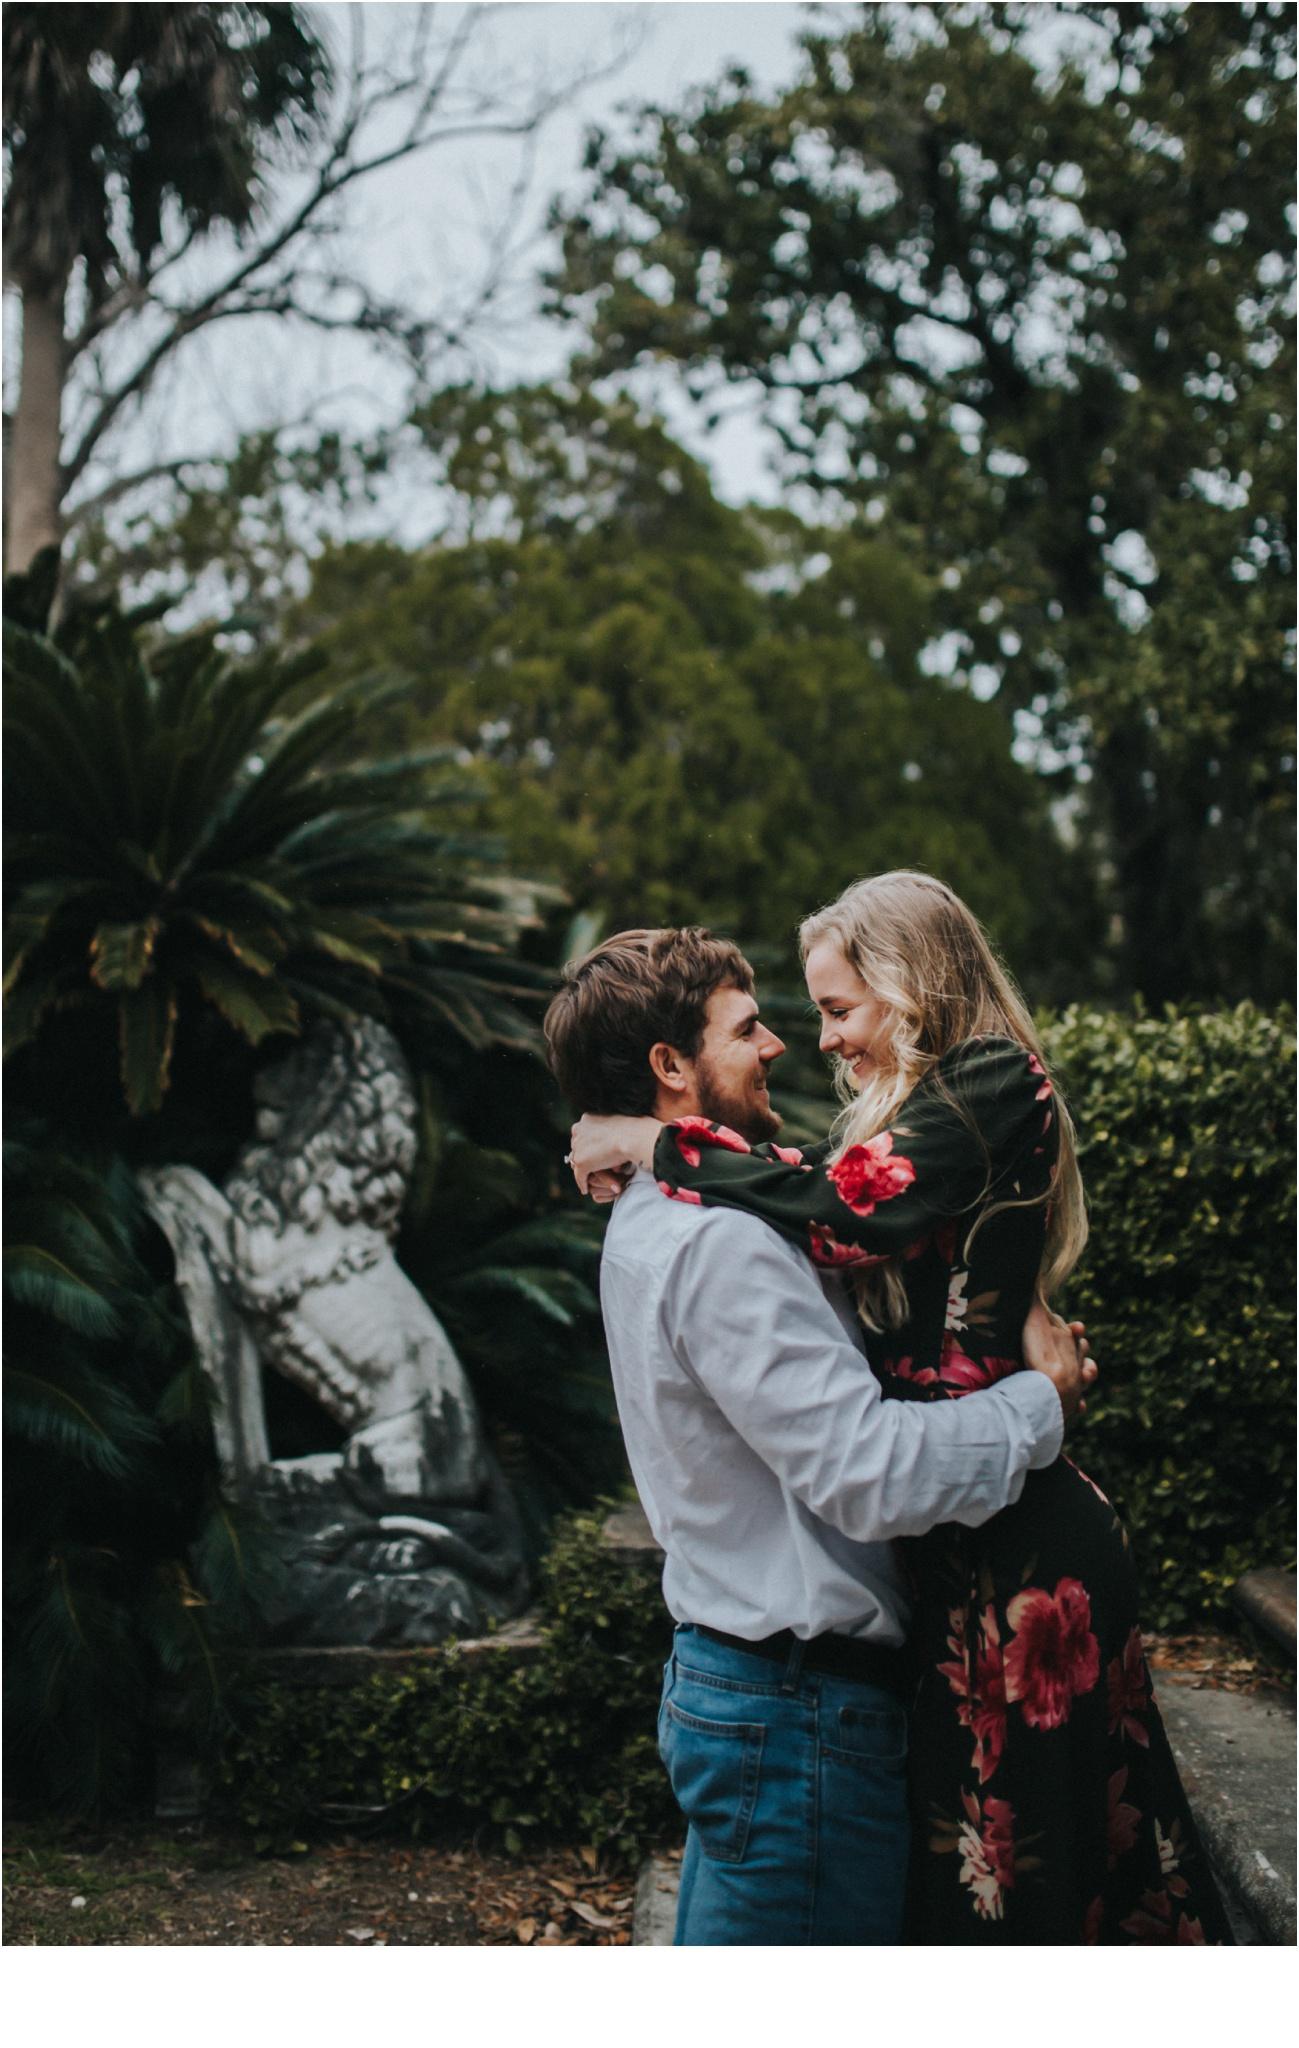 Rainey_Gregg_Photography_St._Simons_Island_Georgia_California_Wedding_Portrait_Photography_0704.jpg